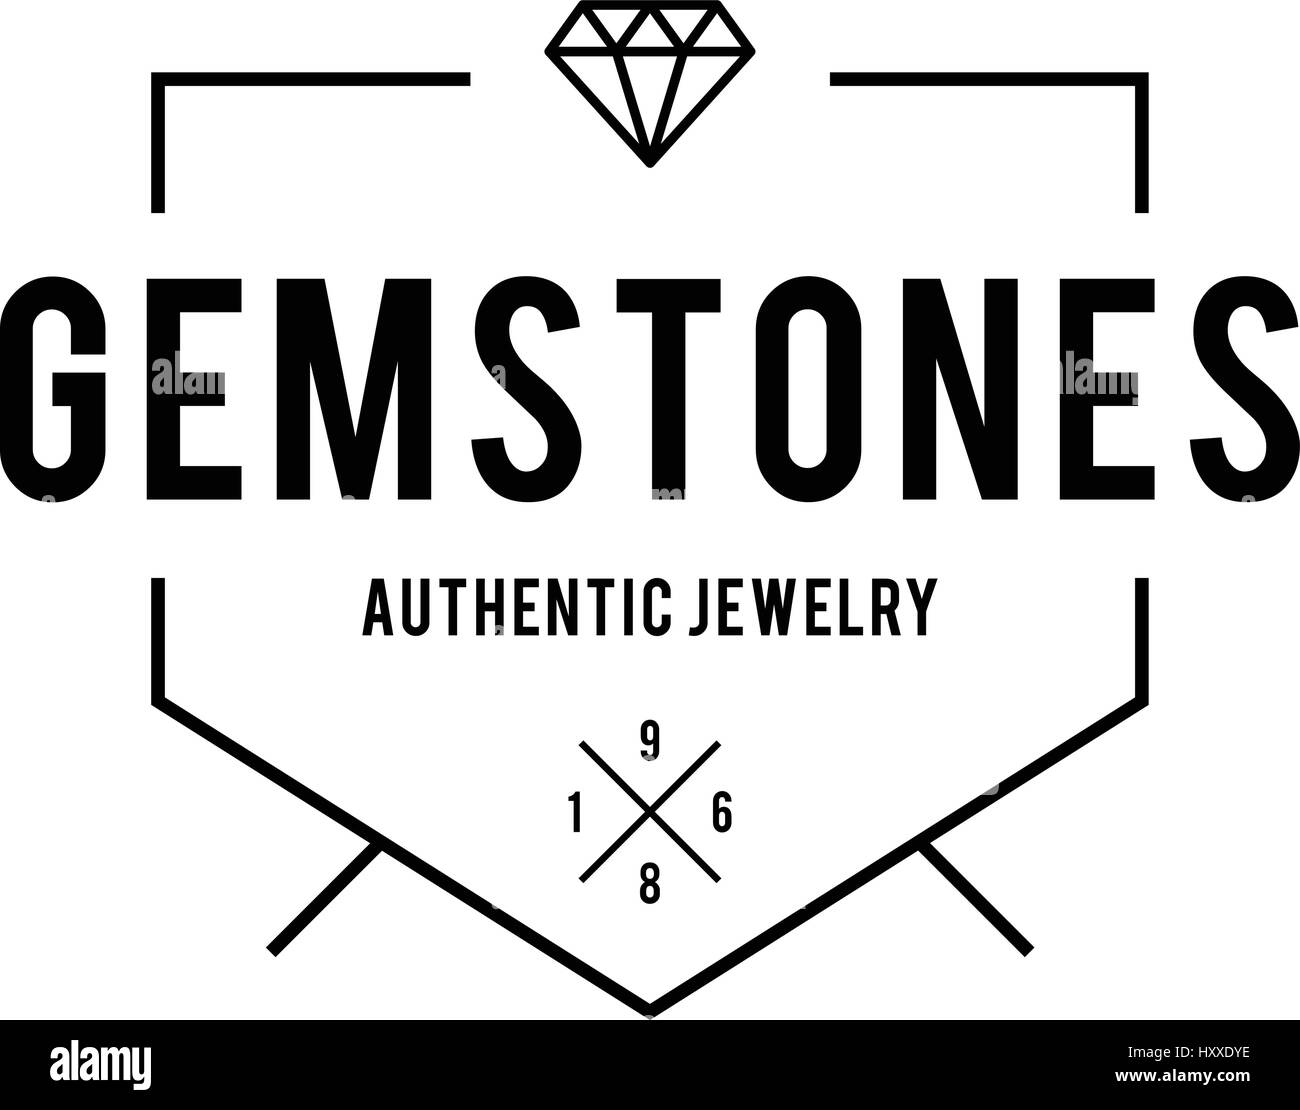 Diamond and Jewels Retro Vintage Badge Labels - Stock Image